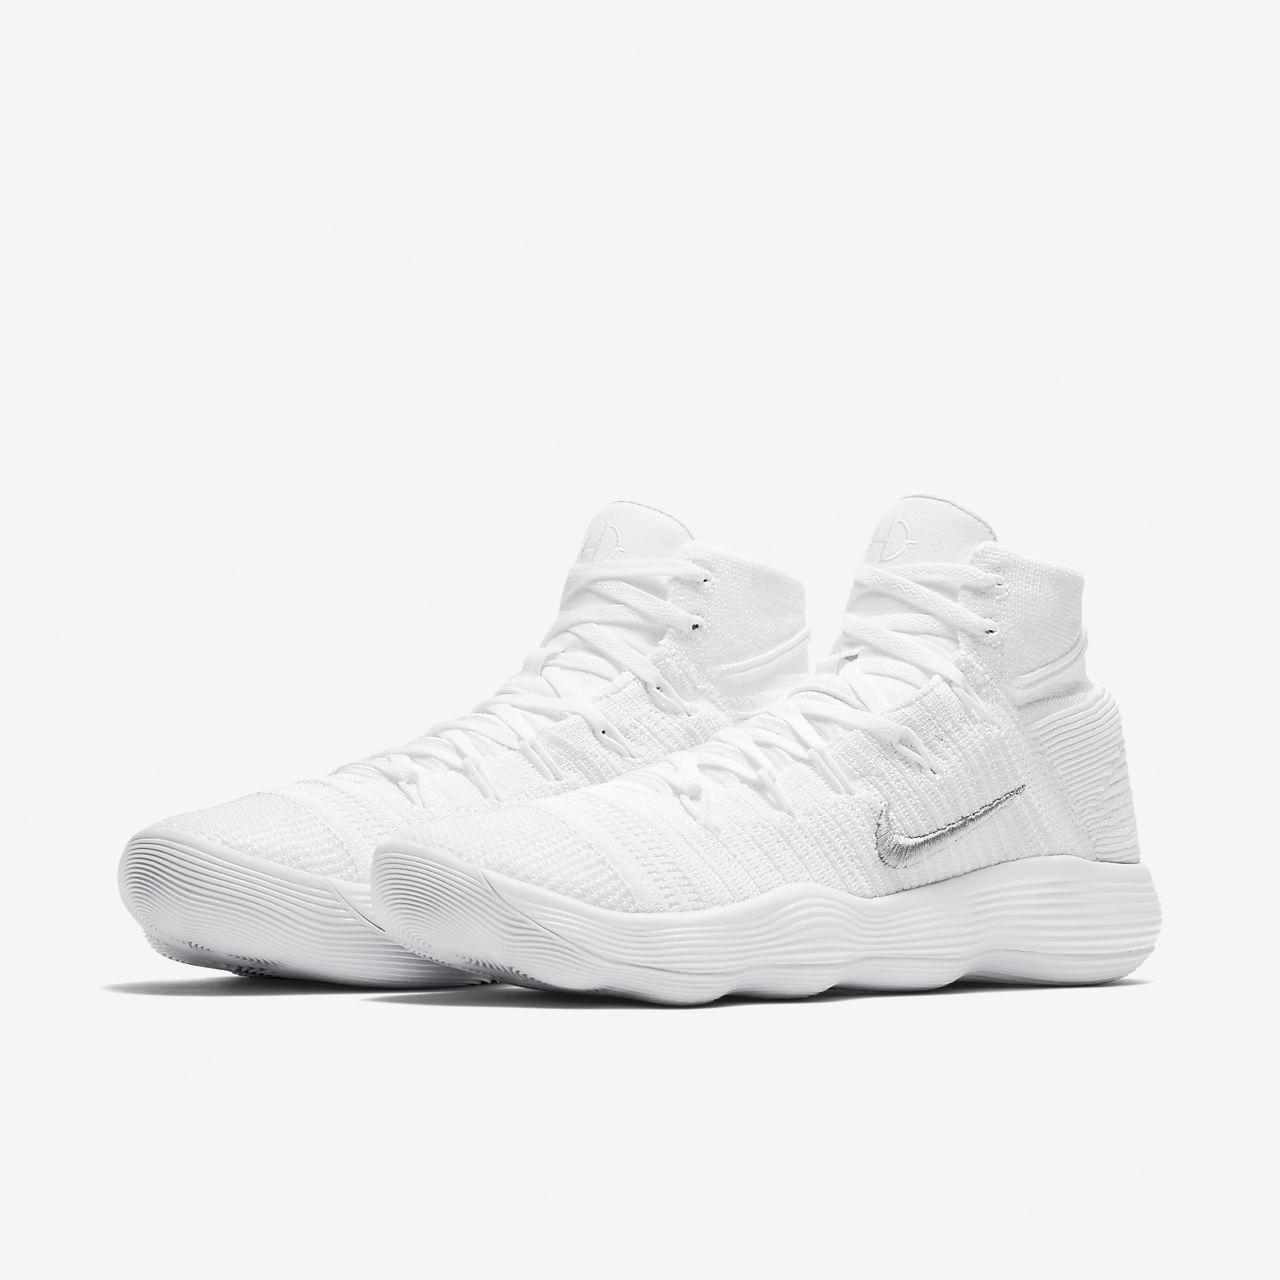 pretty nice 246c9 50f79 2018 Legit Cheap adidas Dame 4 Static Core Black Running White adidas  Basketball Shoe For Sale